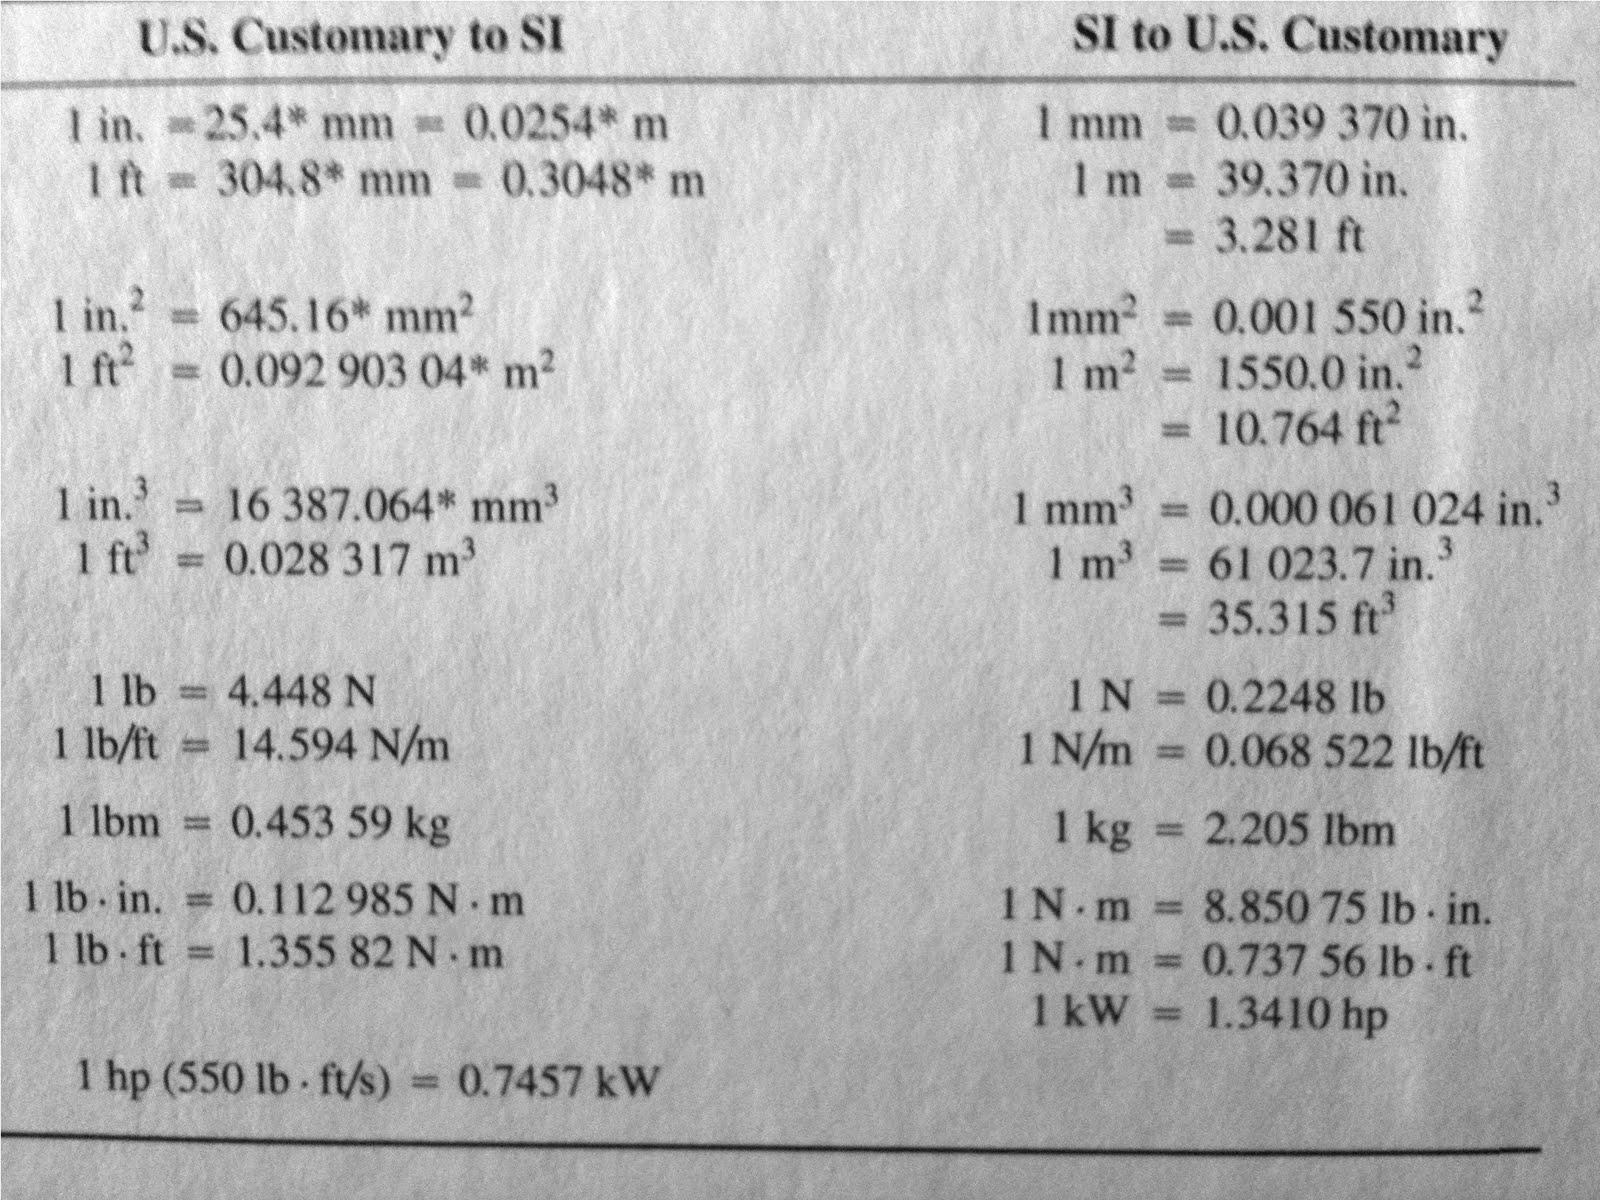 Civil Engineering Study Guide Equivalence Of U S